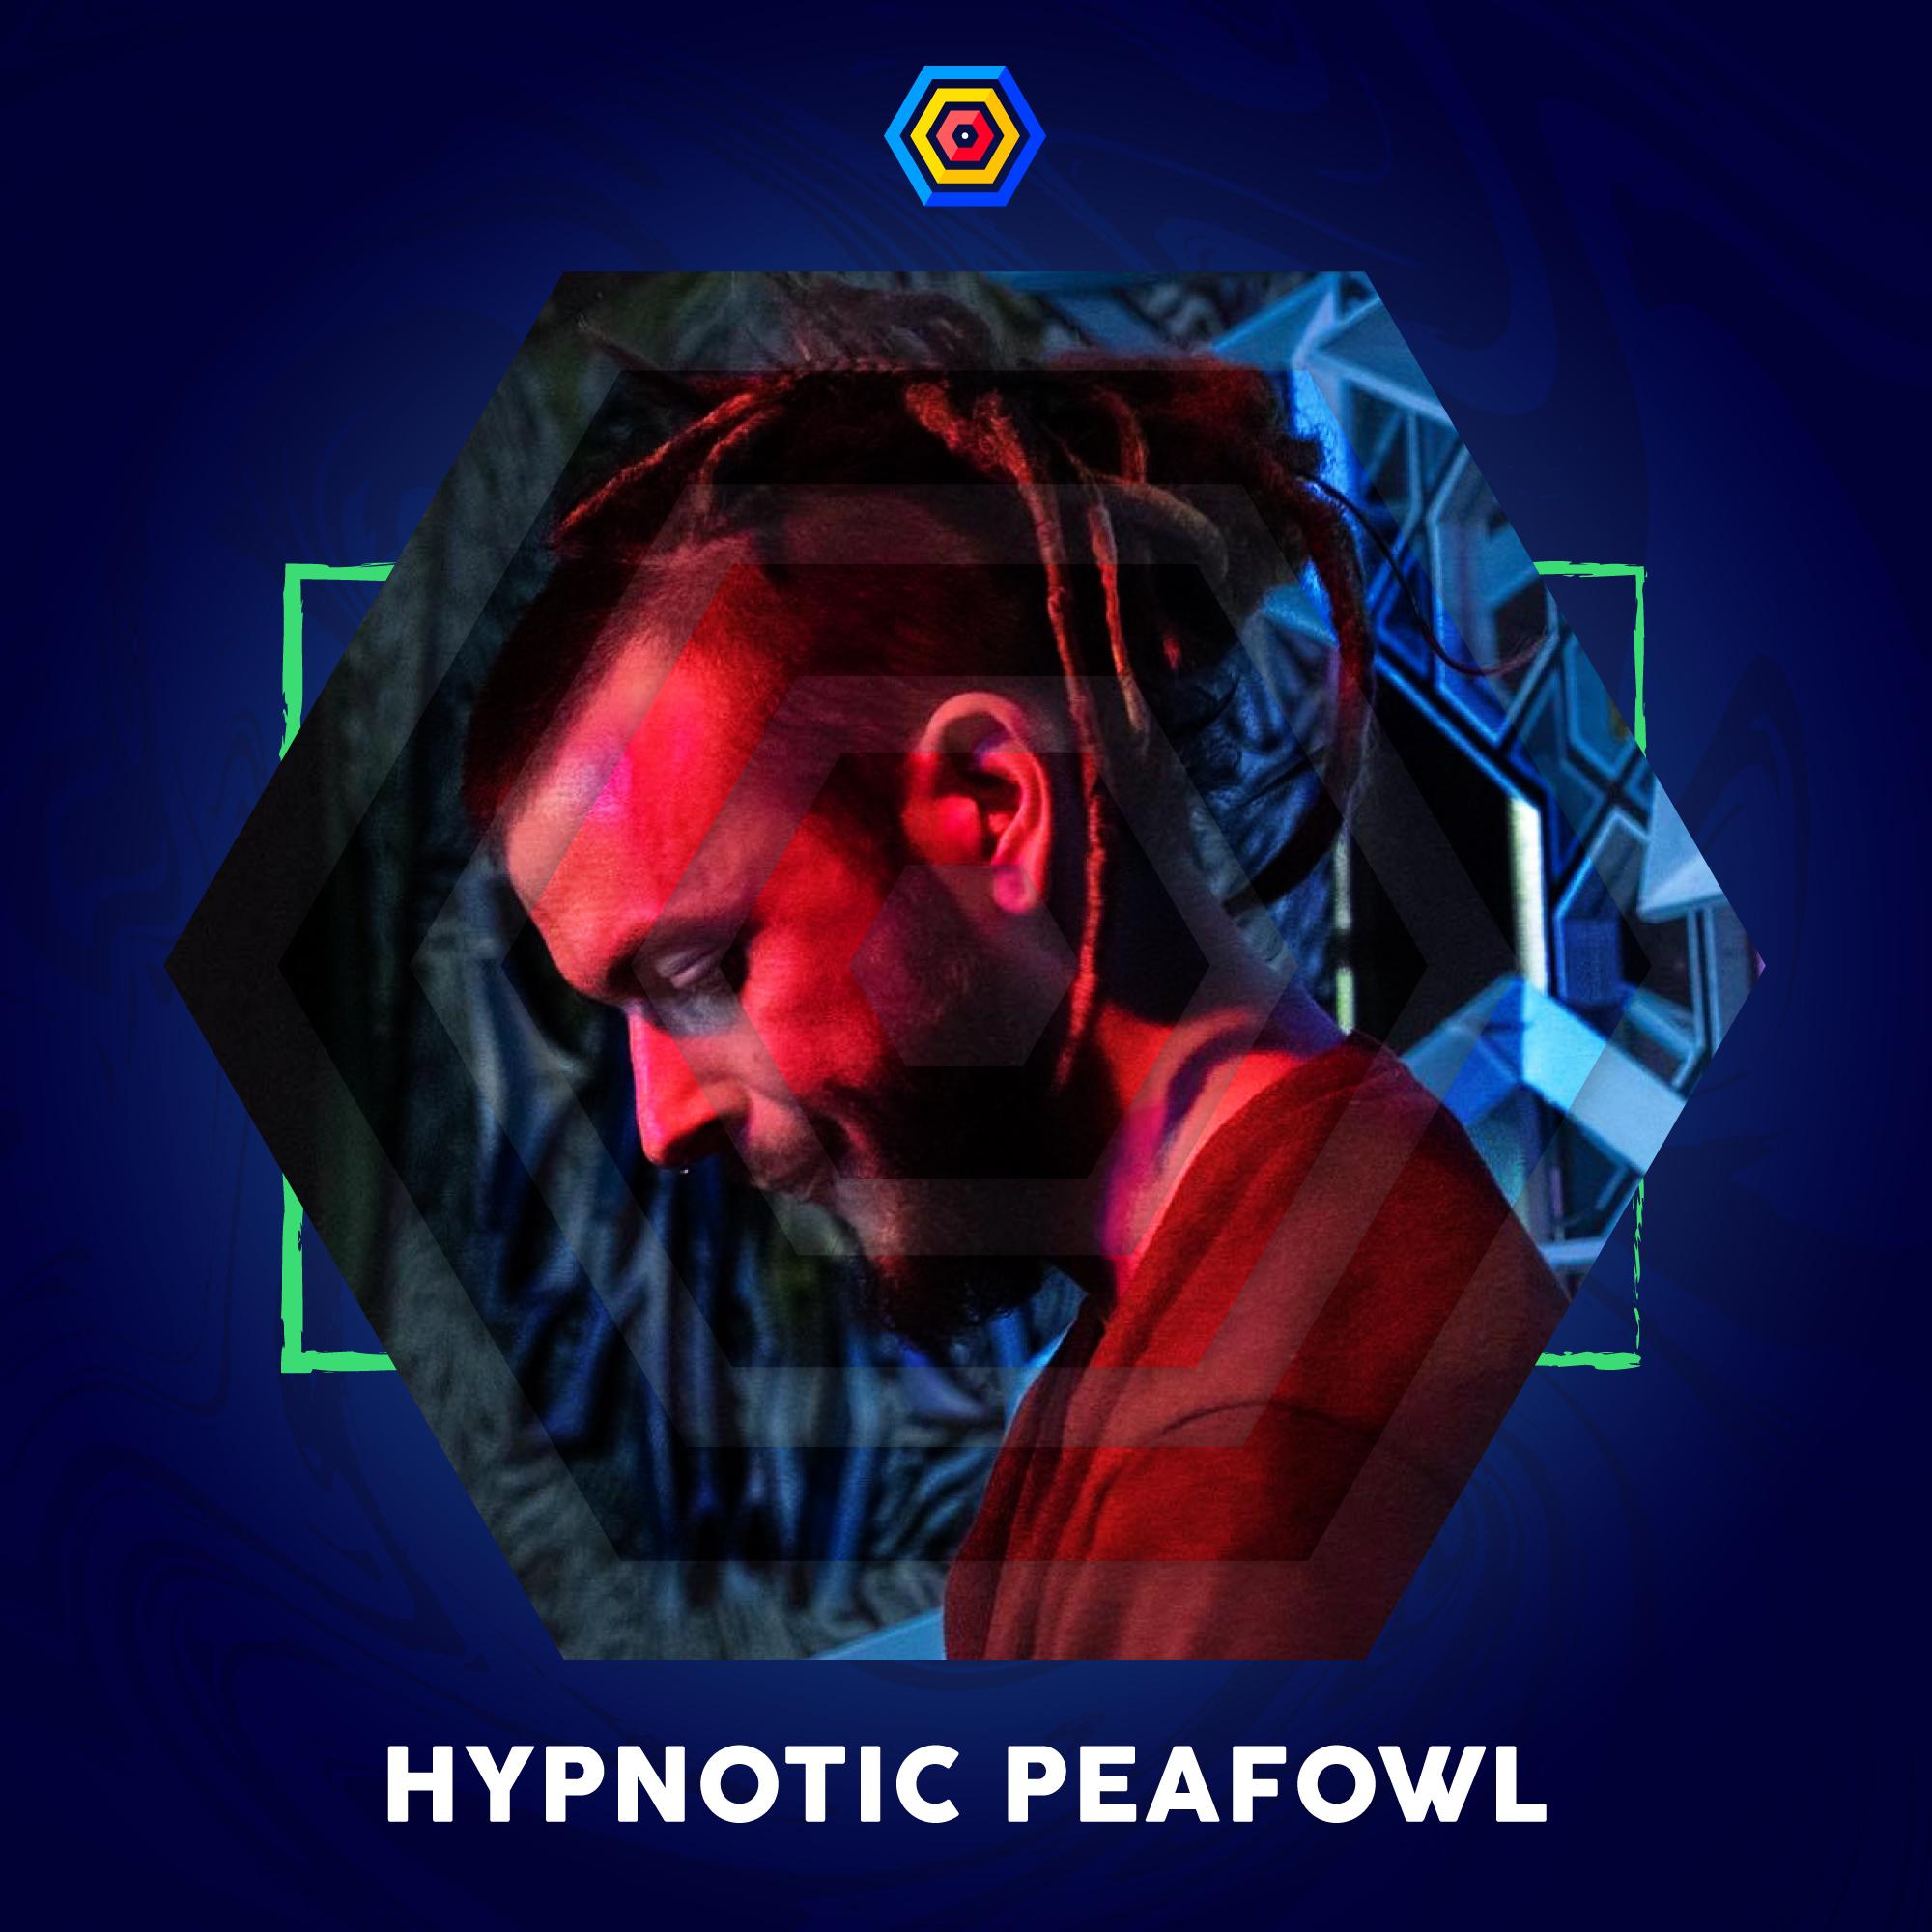 Hypnotic-Peafowl